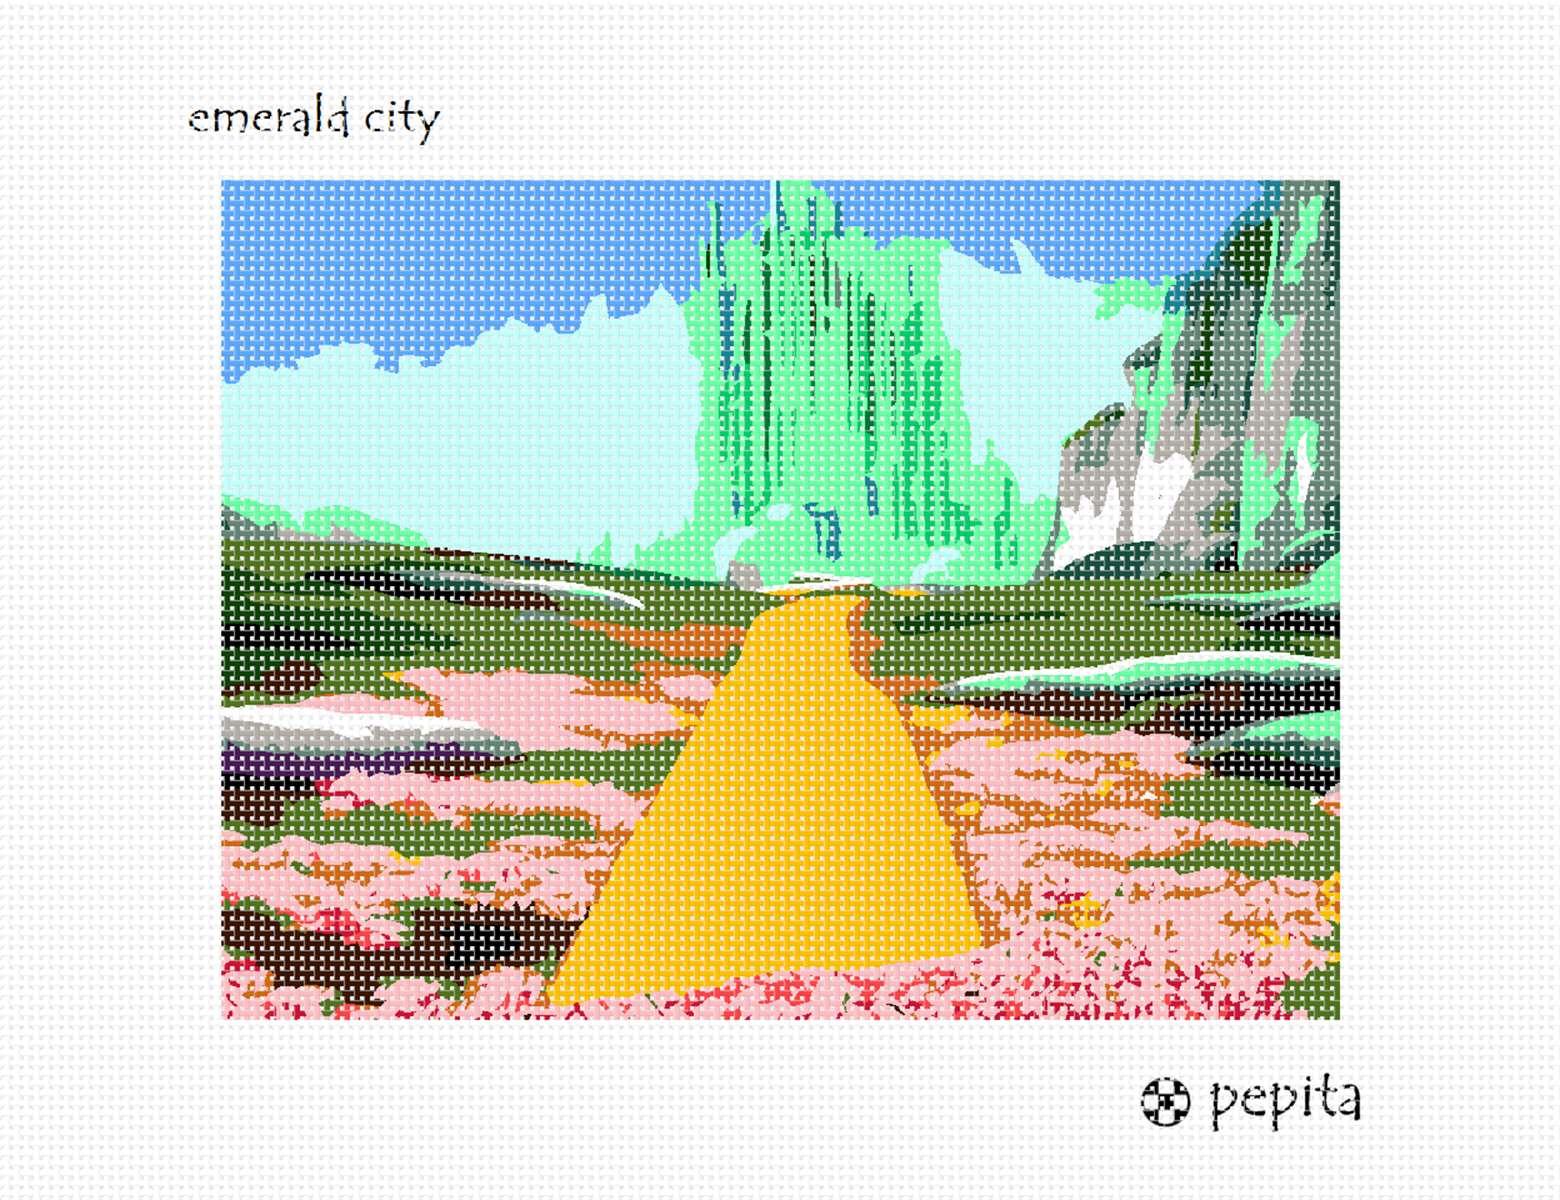 emerald city for pinterest - photo #4